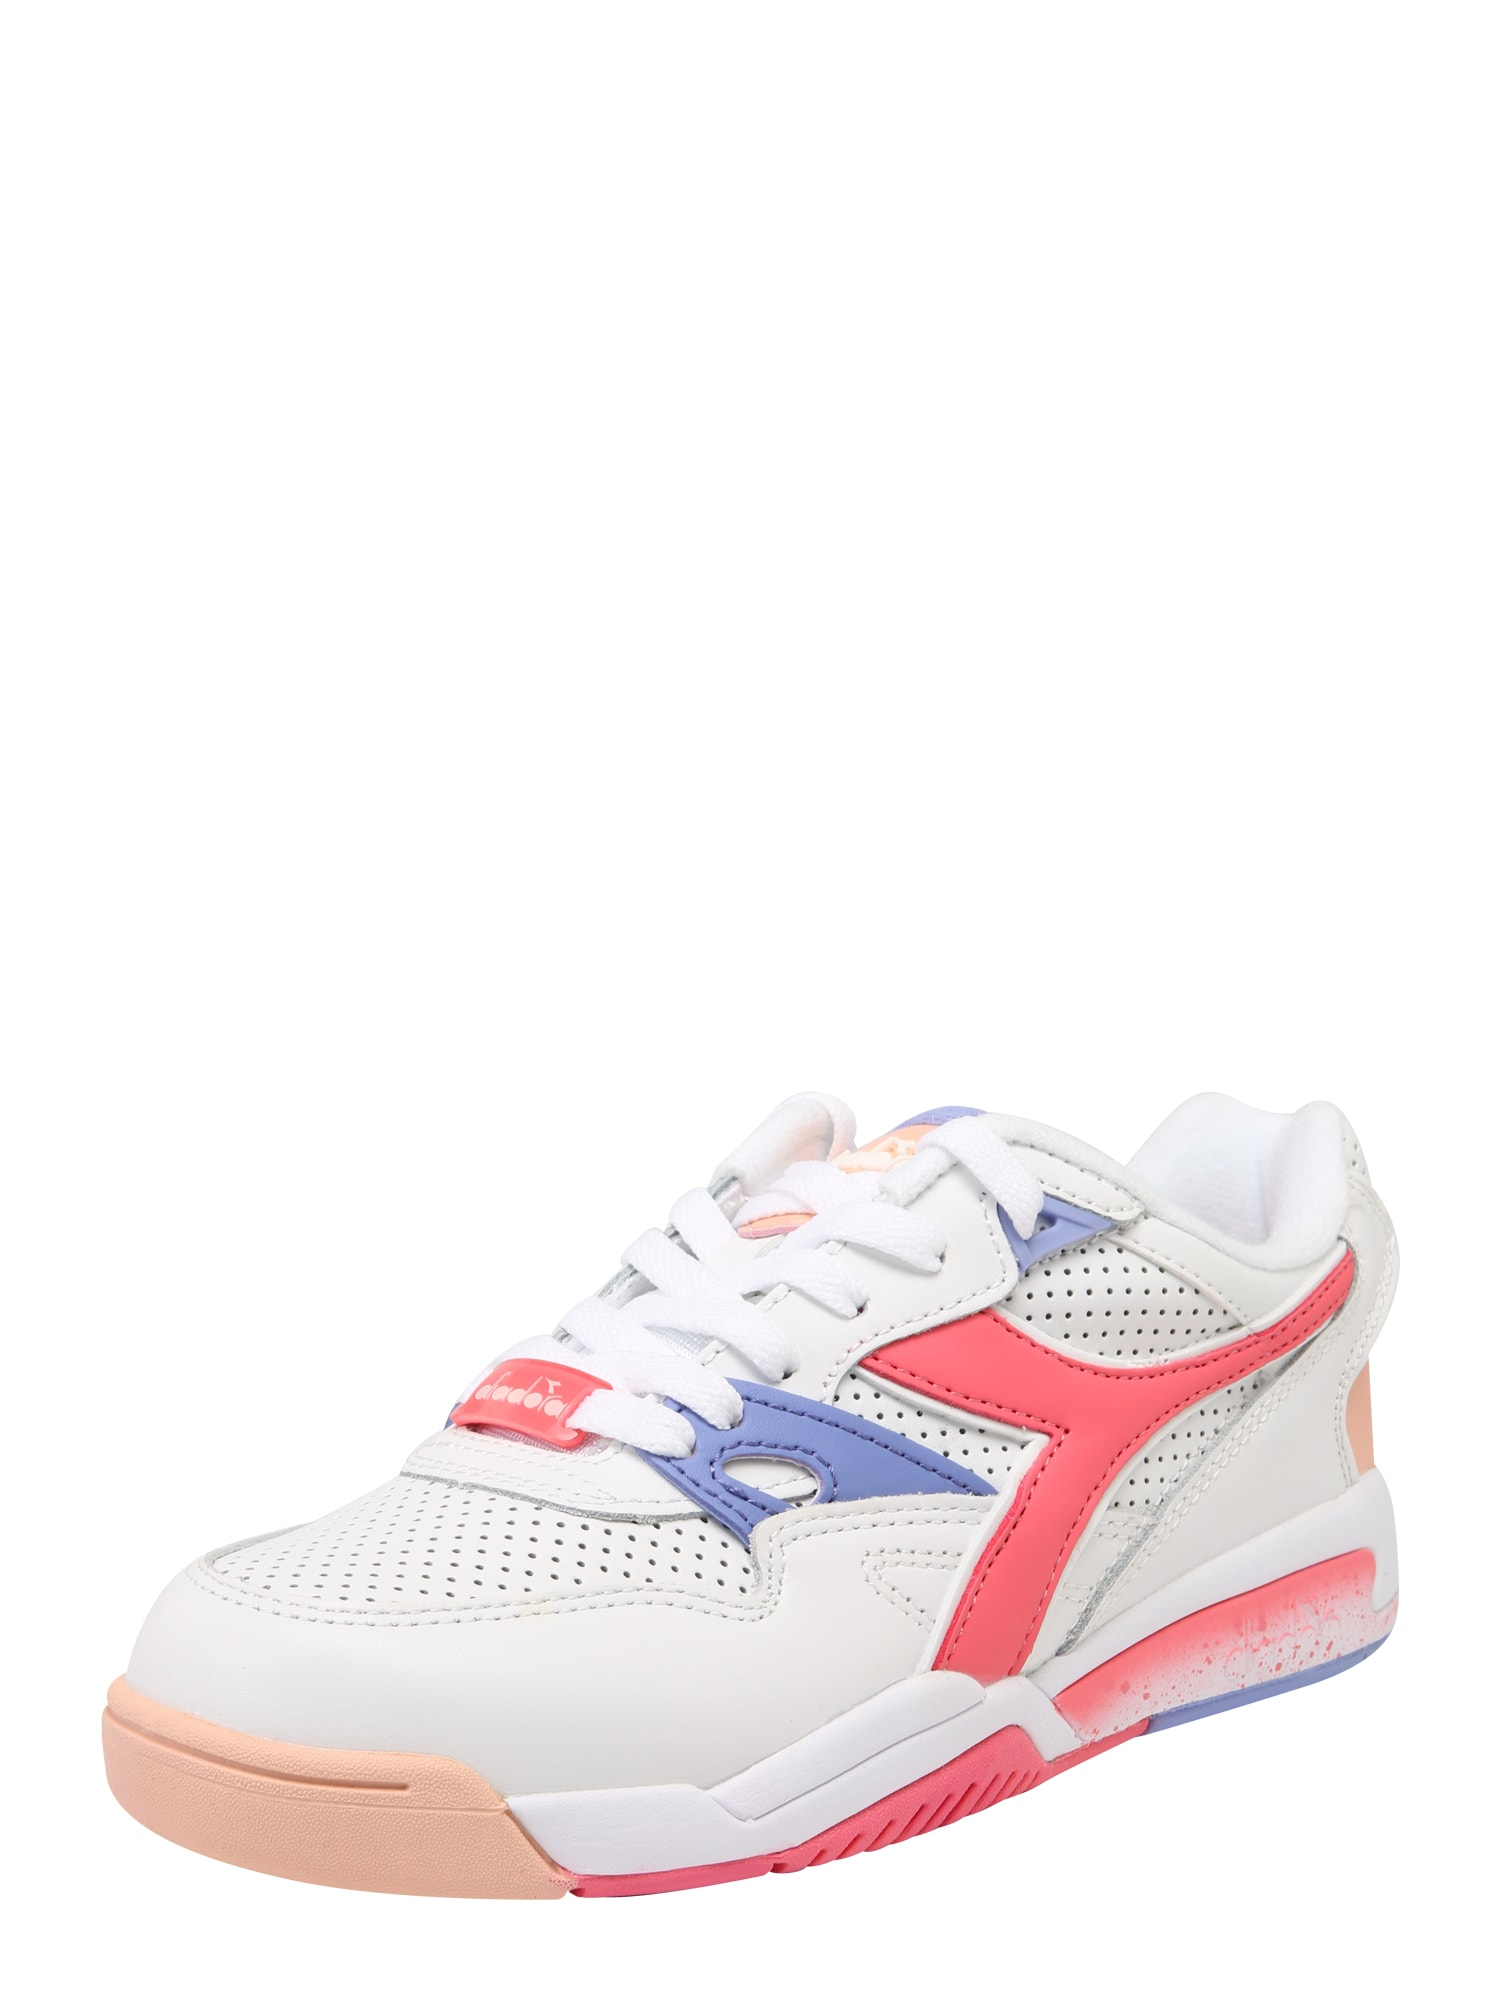 Tenisky REBOUND ACE fialová pink bílá Diadora